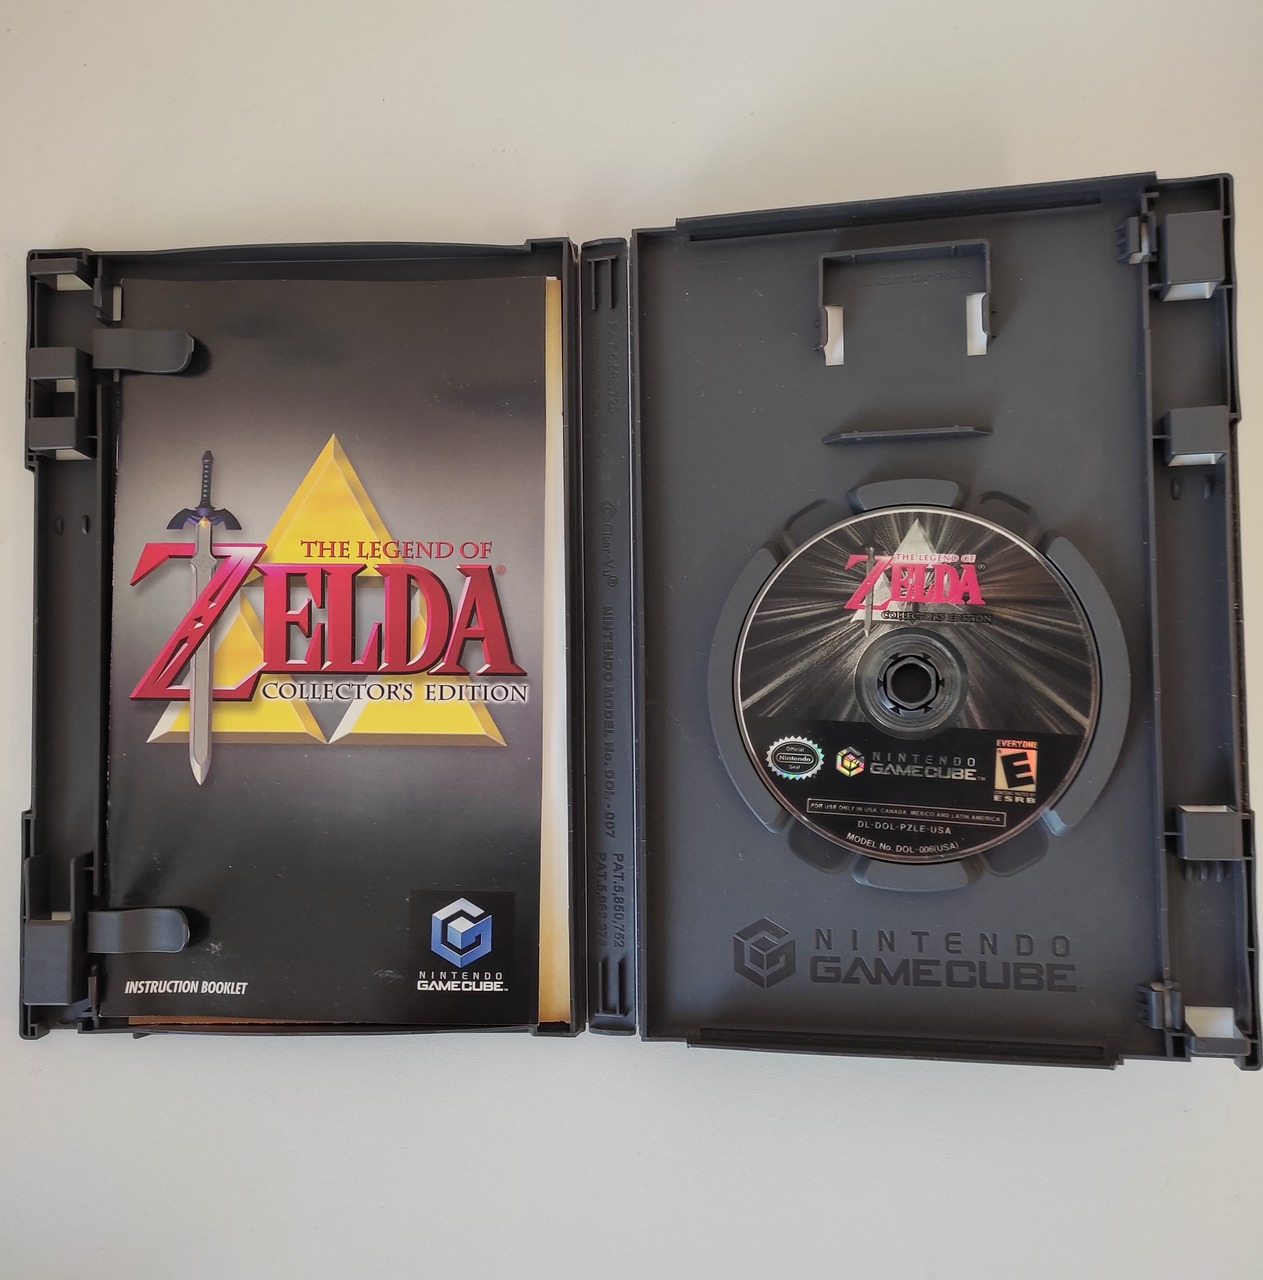 The Legend of Zelda: Collector's Edition - Nintendo GameCube - Usado